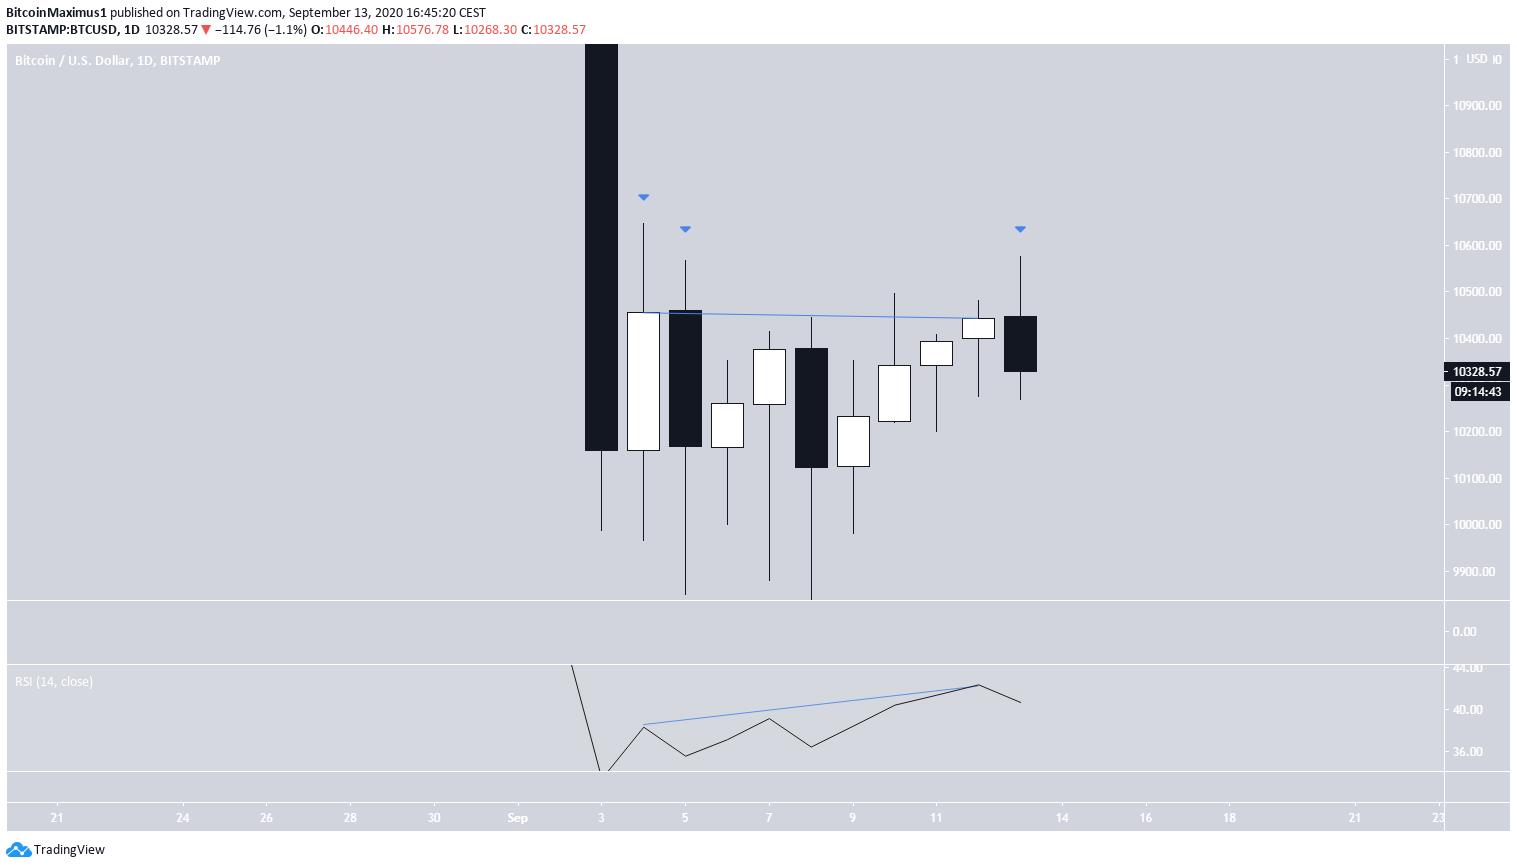 Bitcoin's Daily Decrease